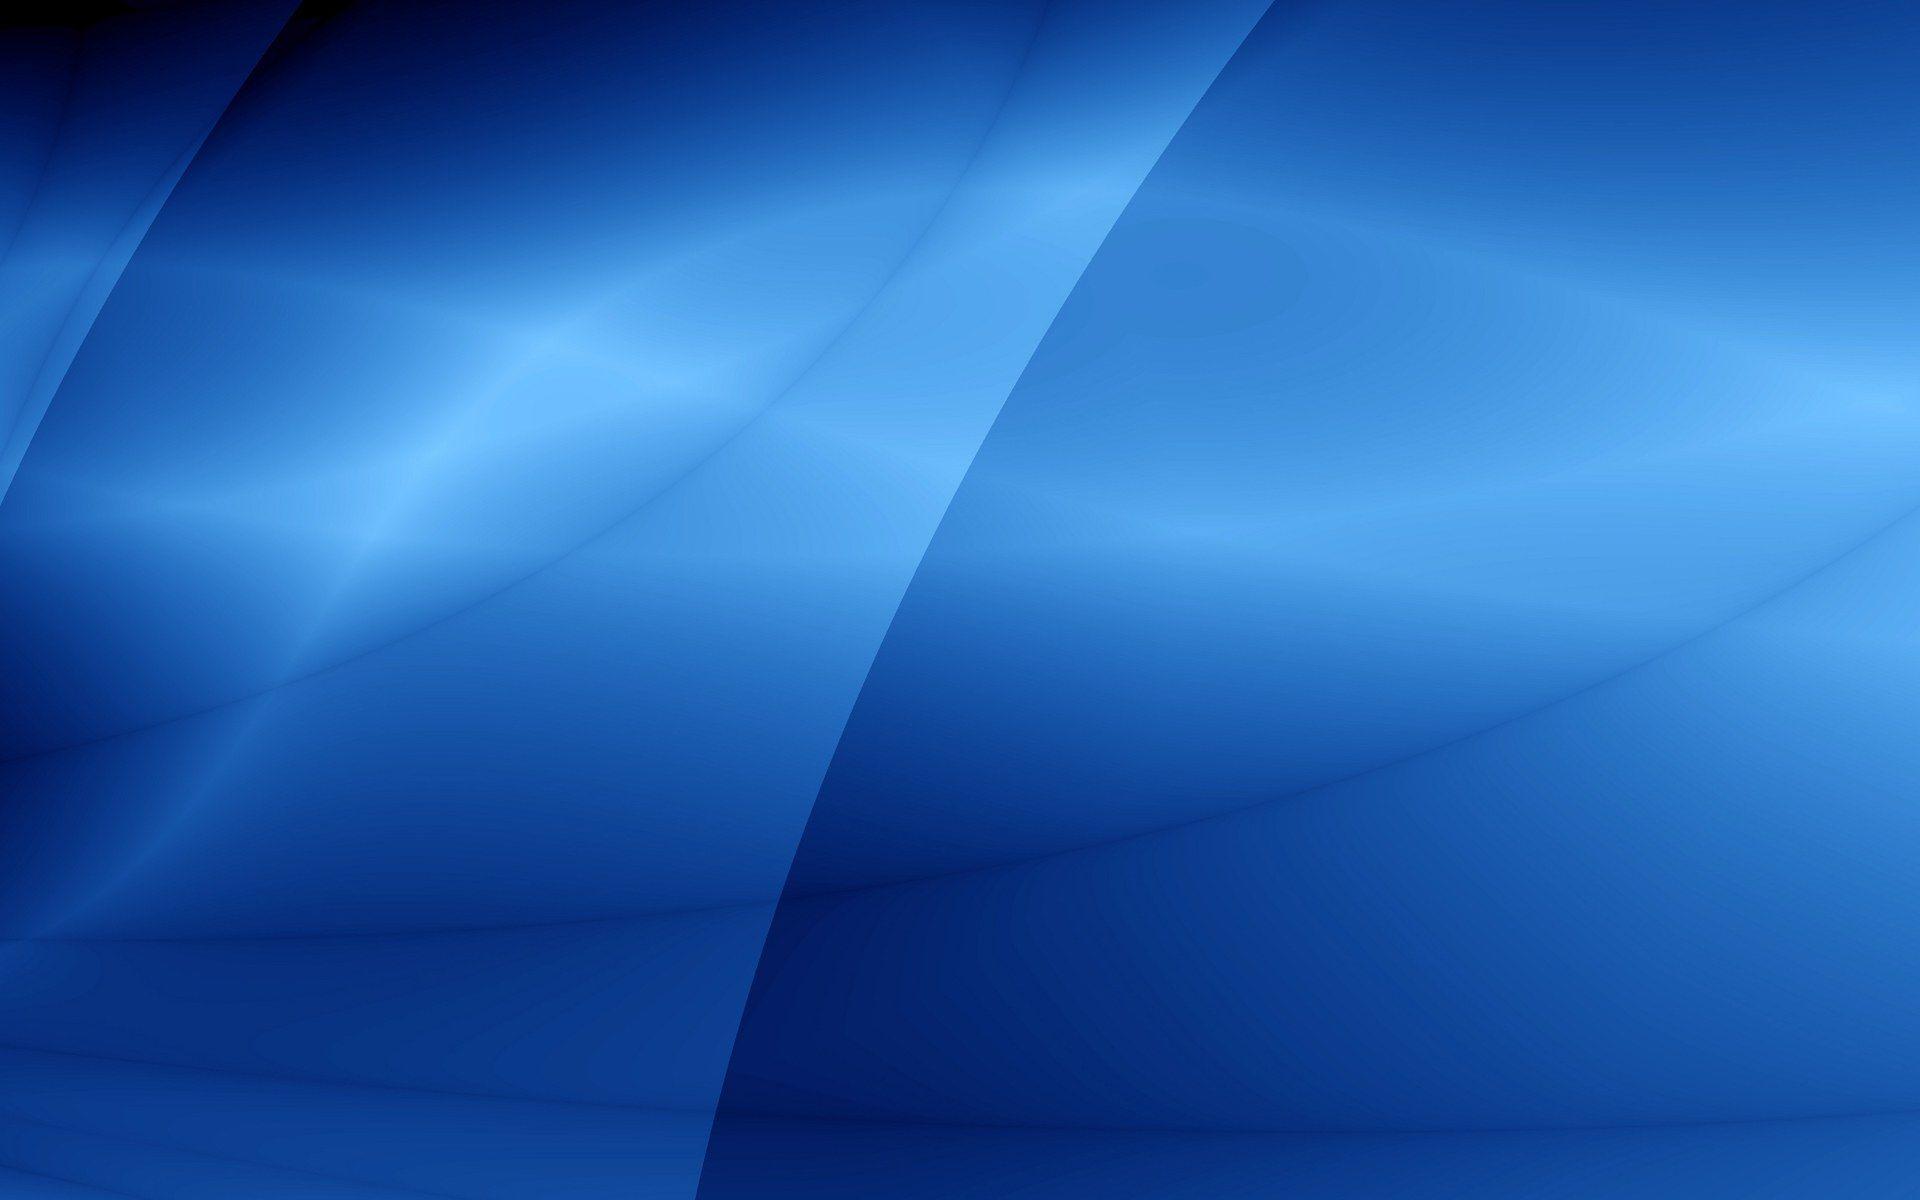 Beautiful Blue Abstract Wallpaper